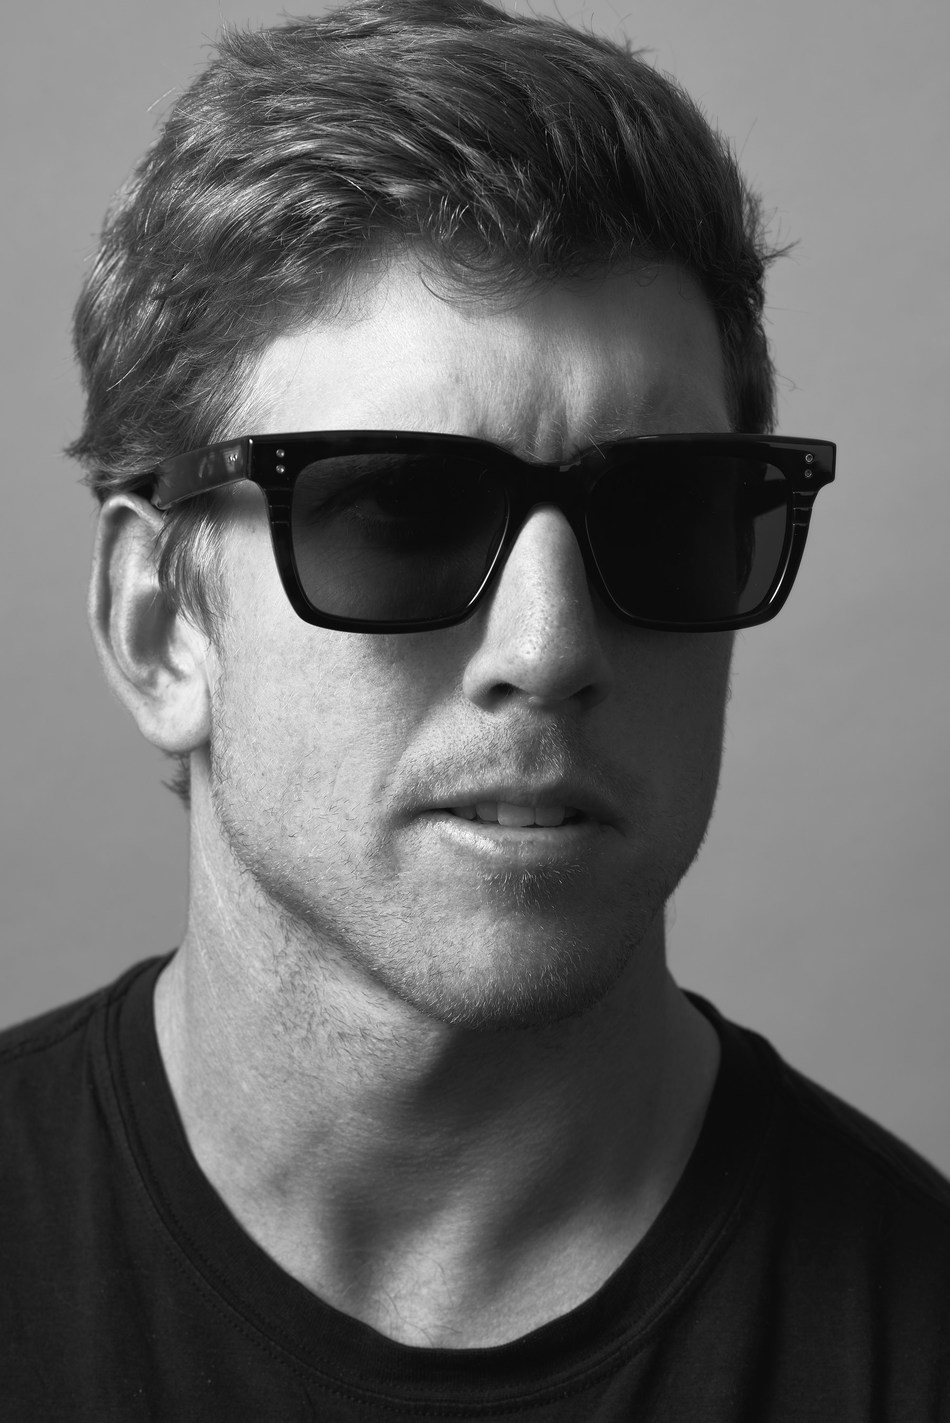 Peter Burling in Mann Sunglasses by DITA Eyewear